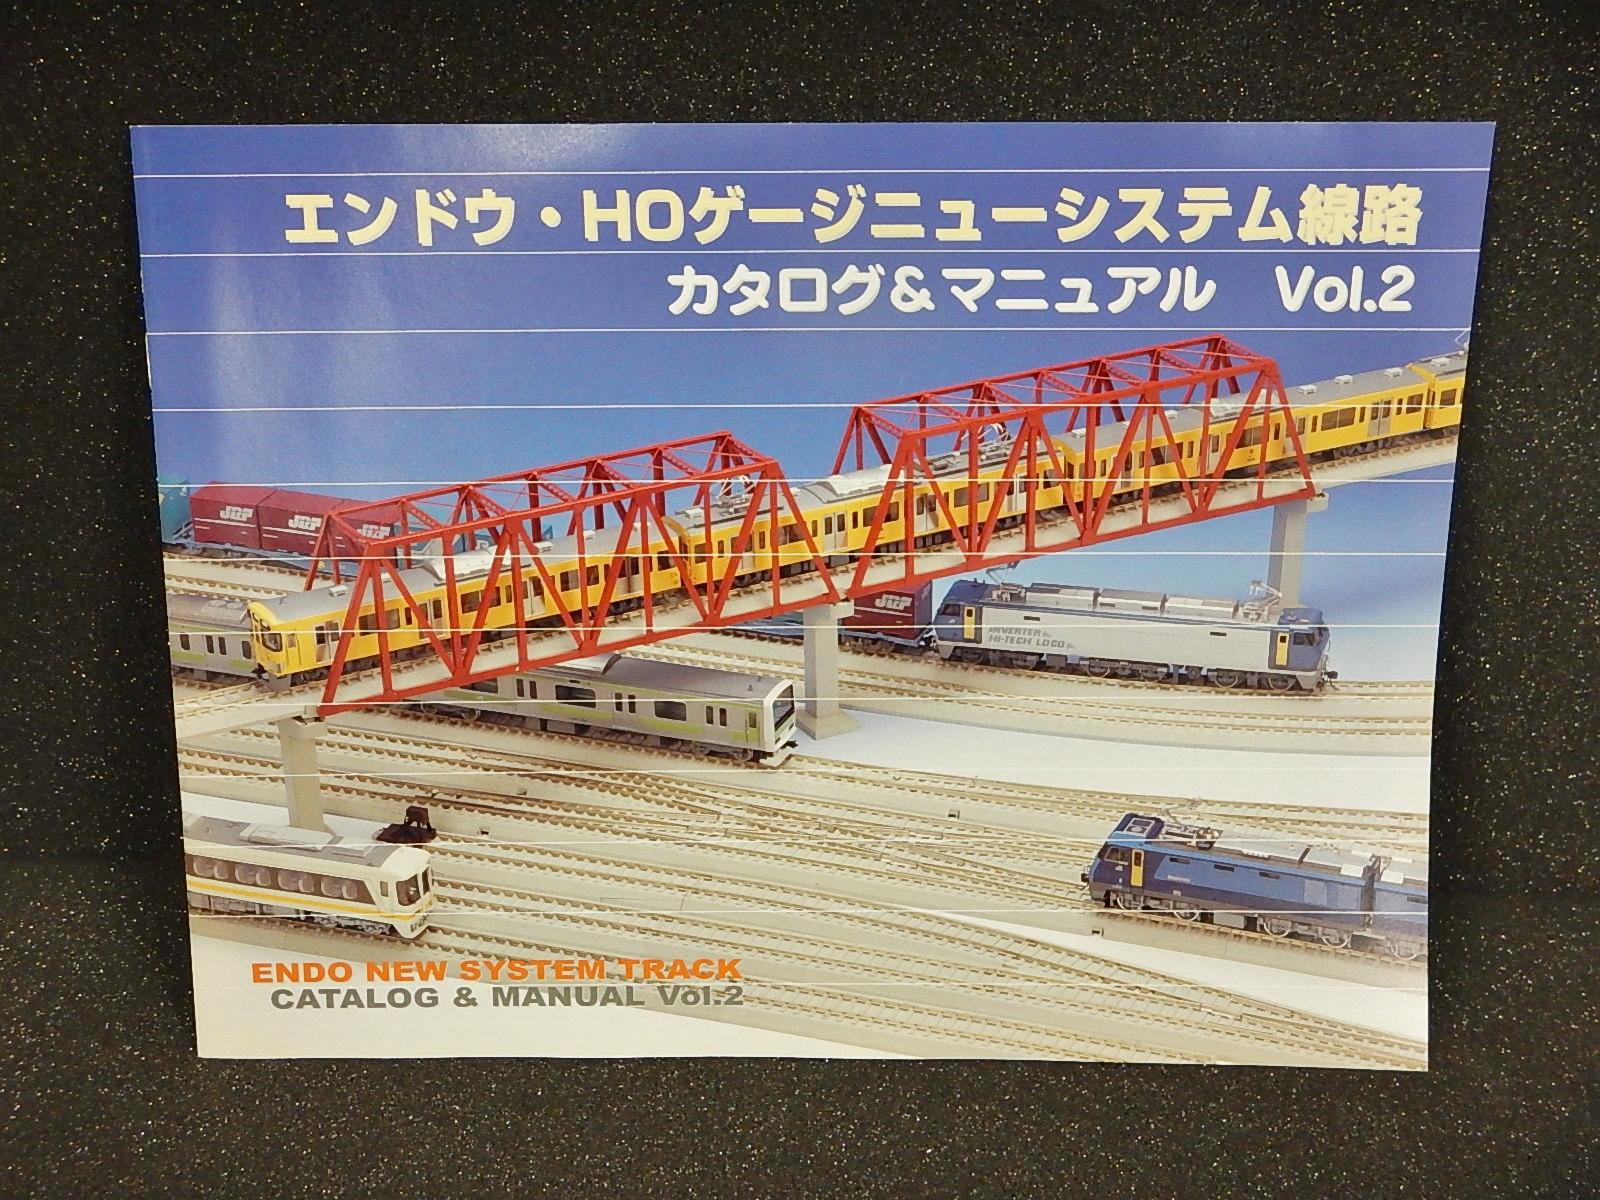 HOゲージ ニューシステム線路 カタログ&マニュアル Vol.2